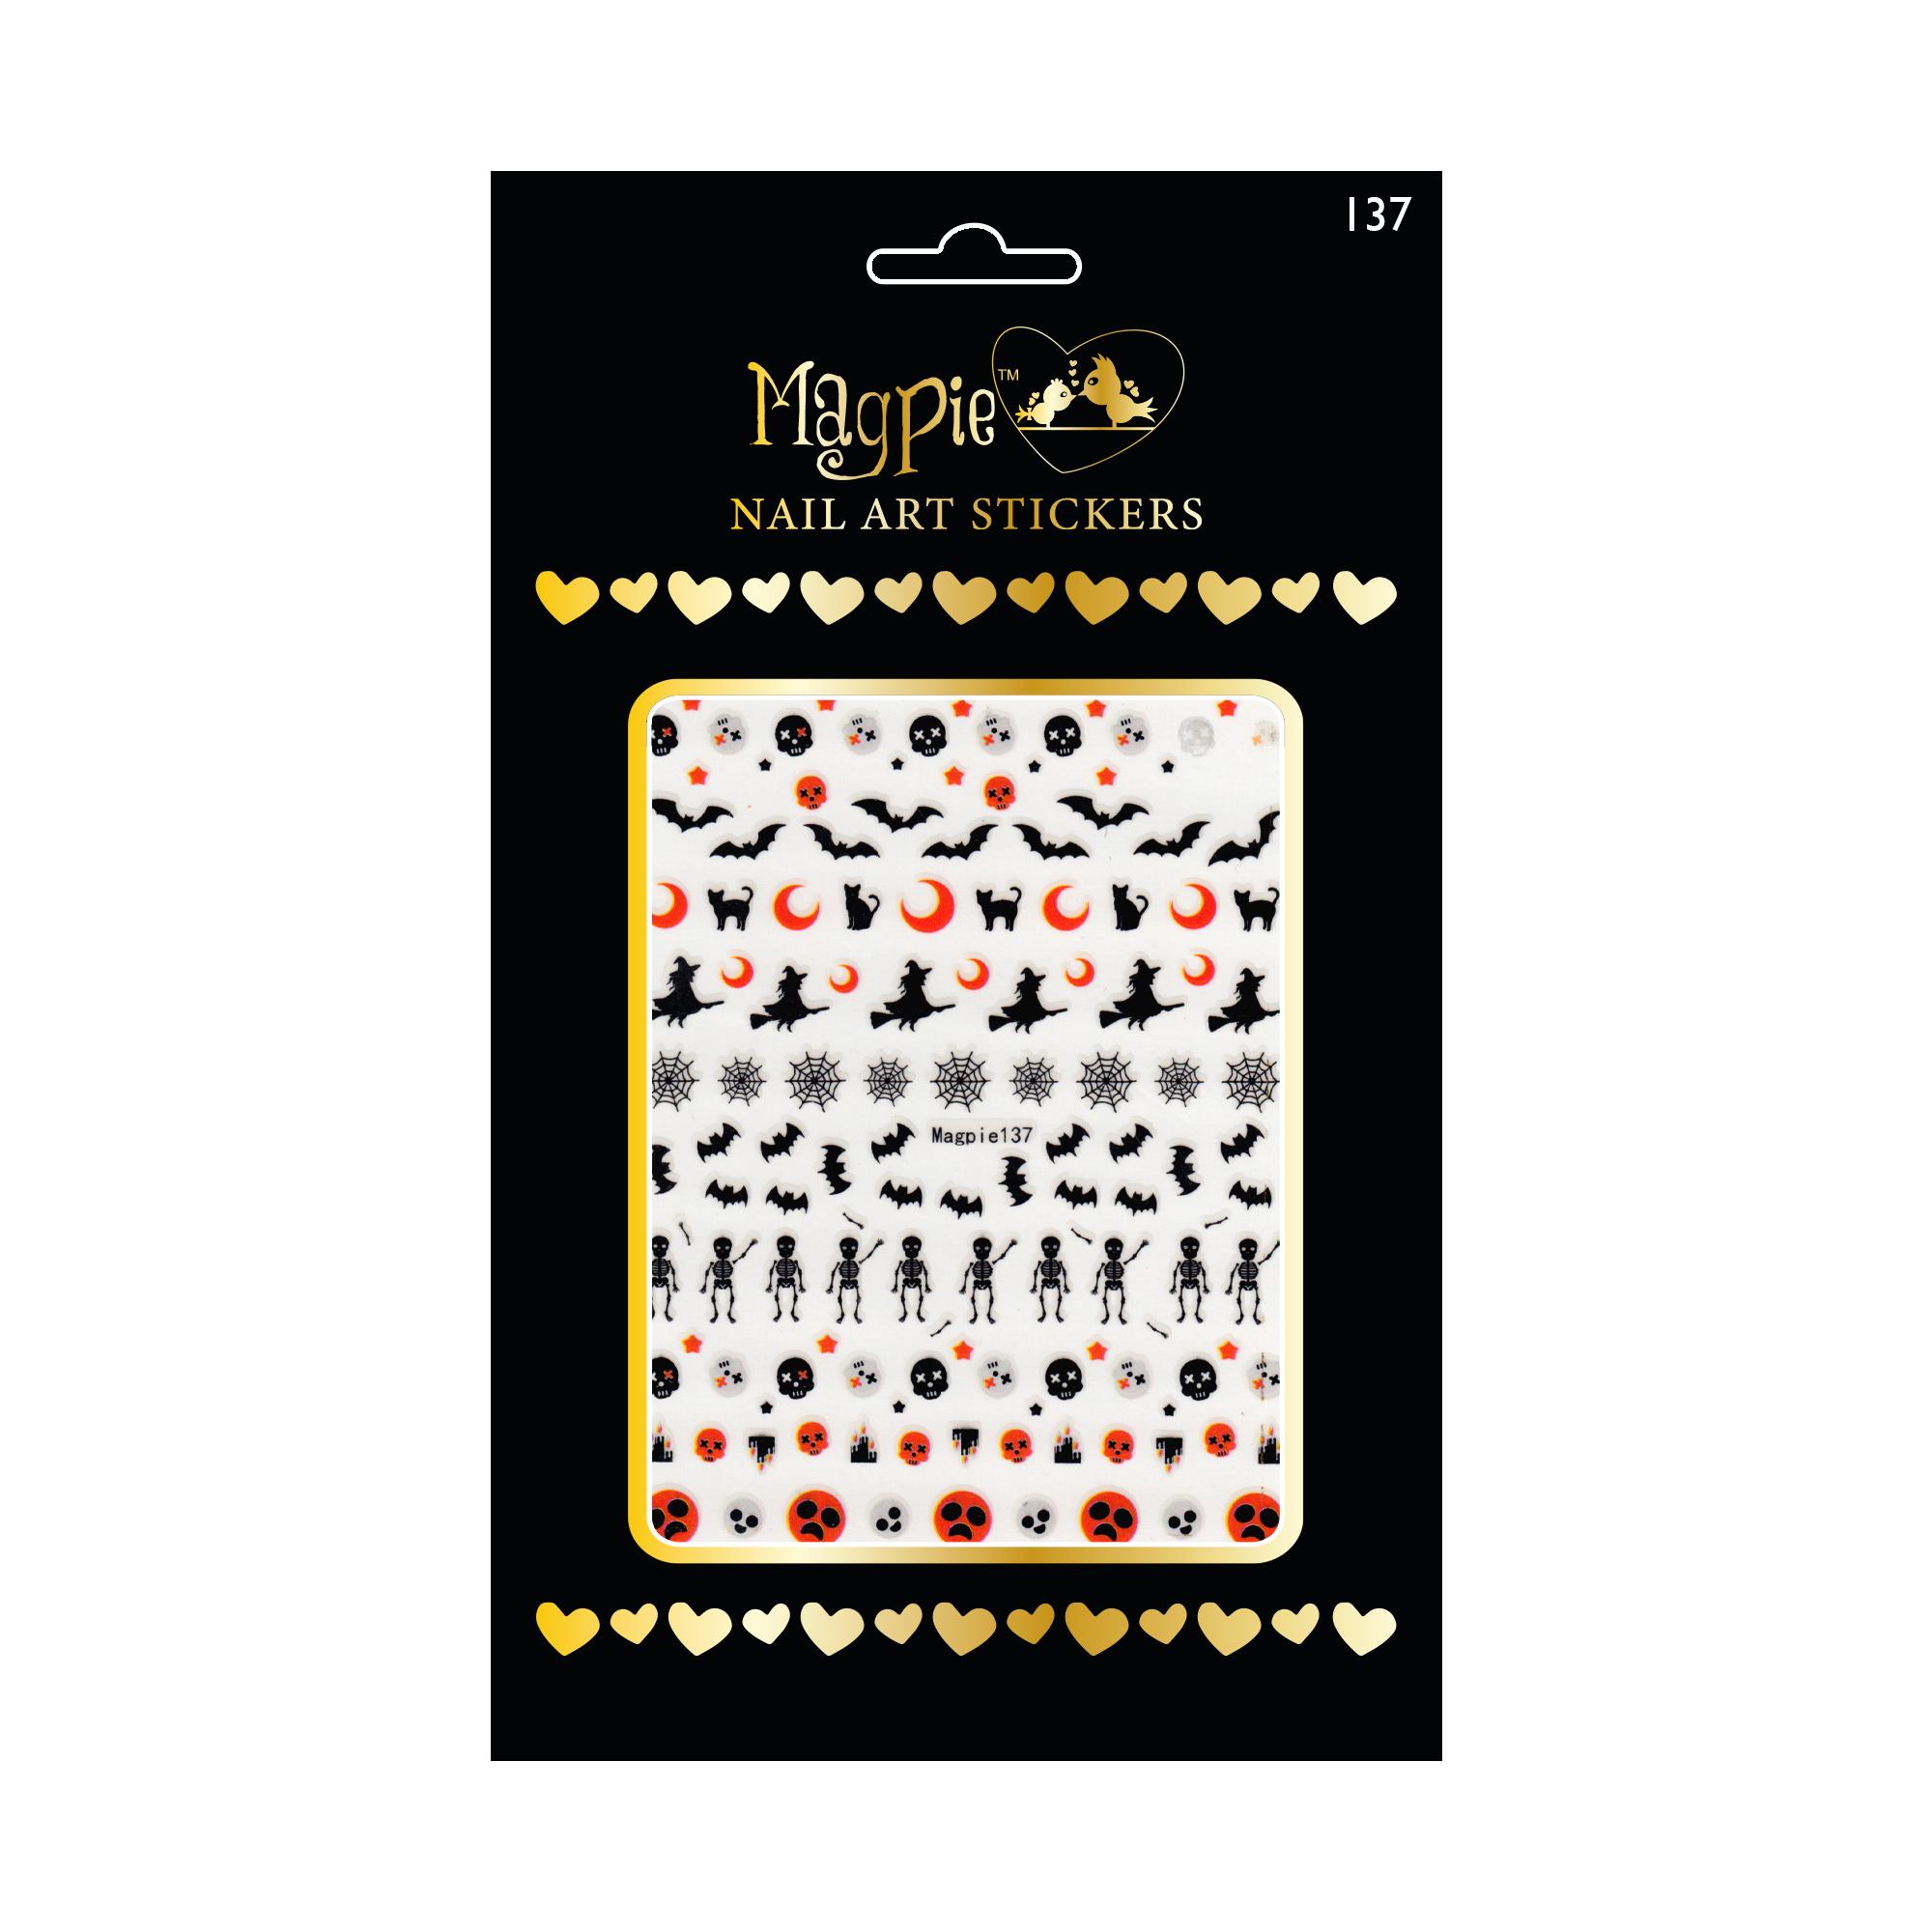 Magpie 137 stickers